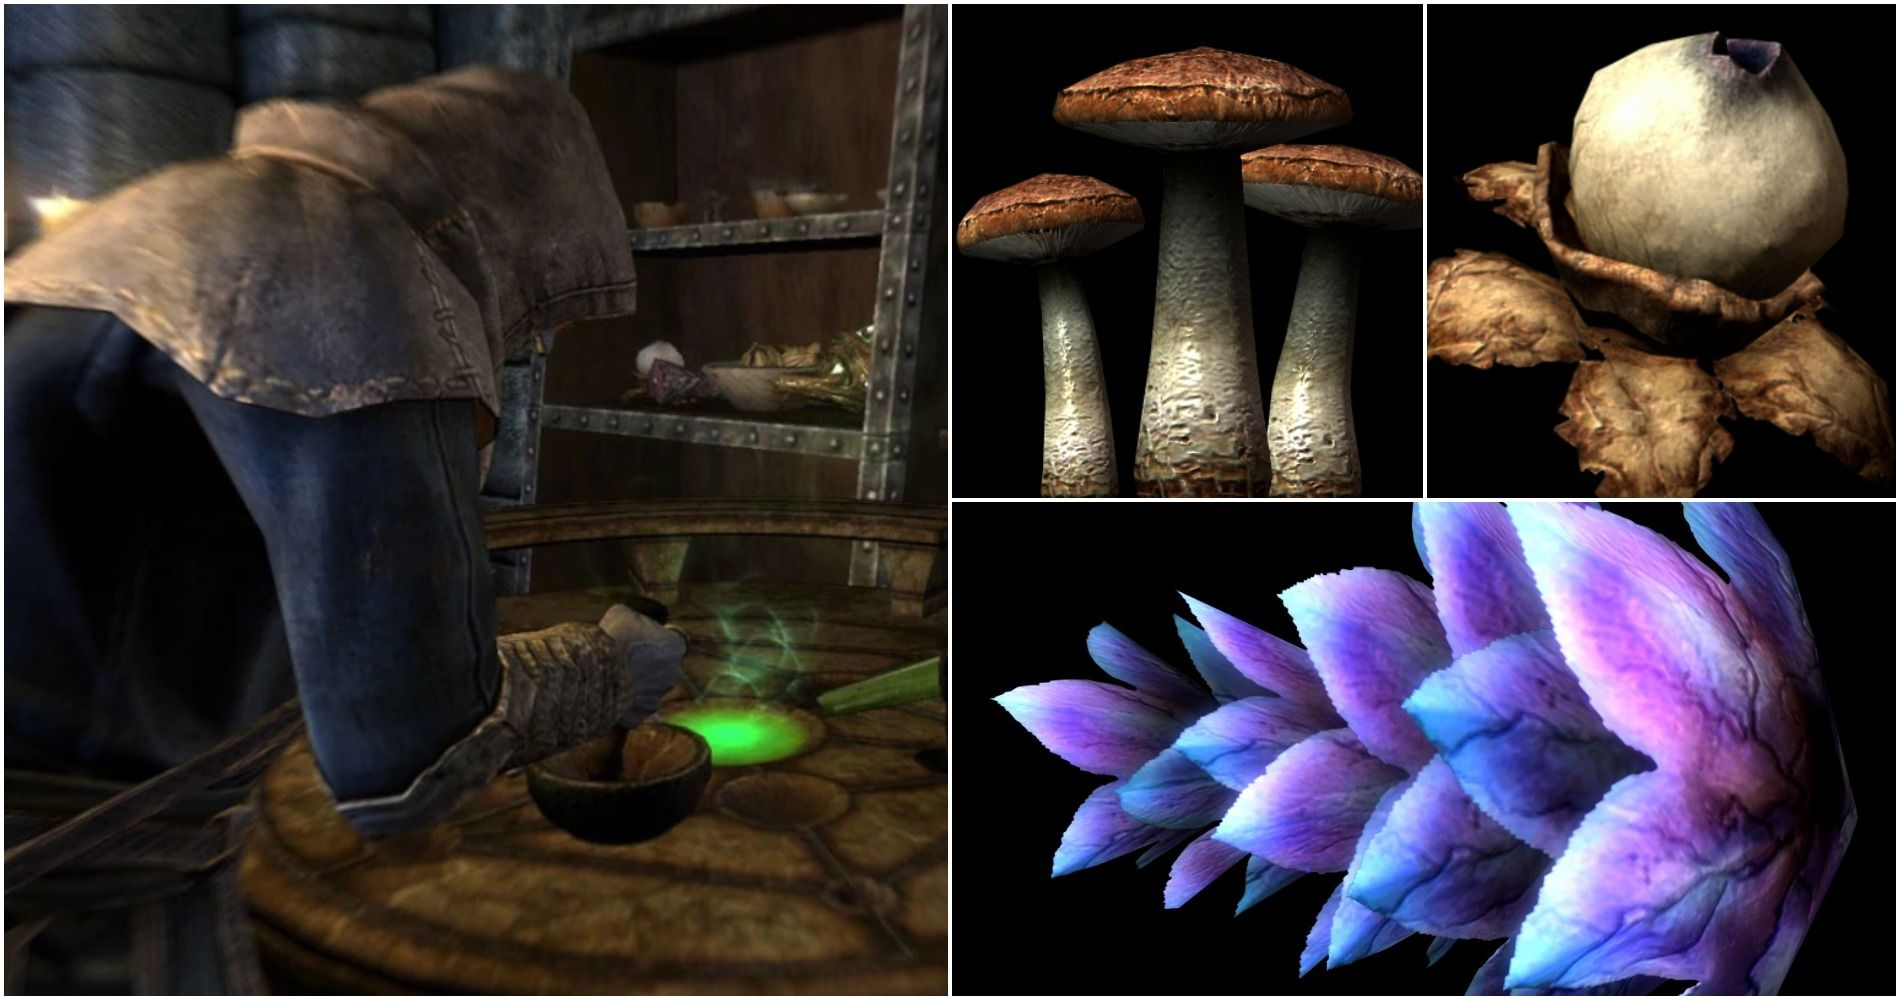 Skyrim: 10 Devastating Poisons & How To Make Them | Game Rant